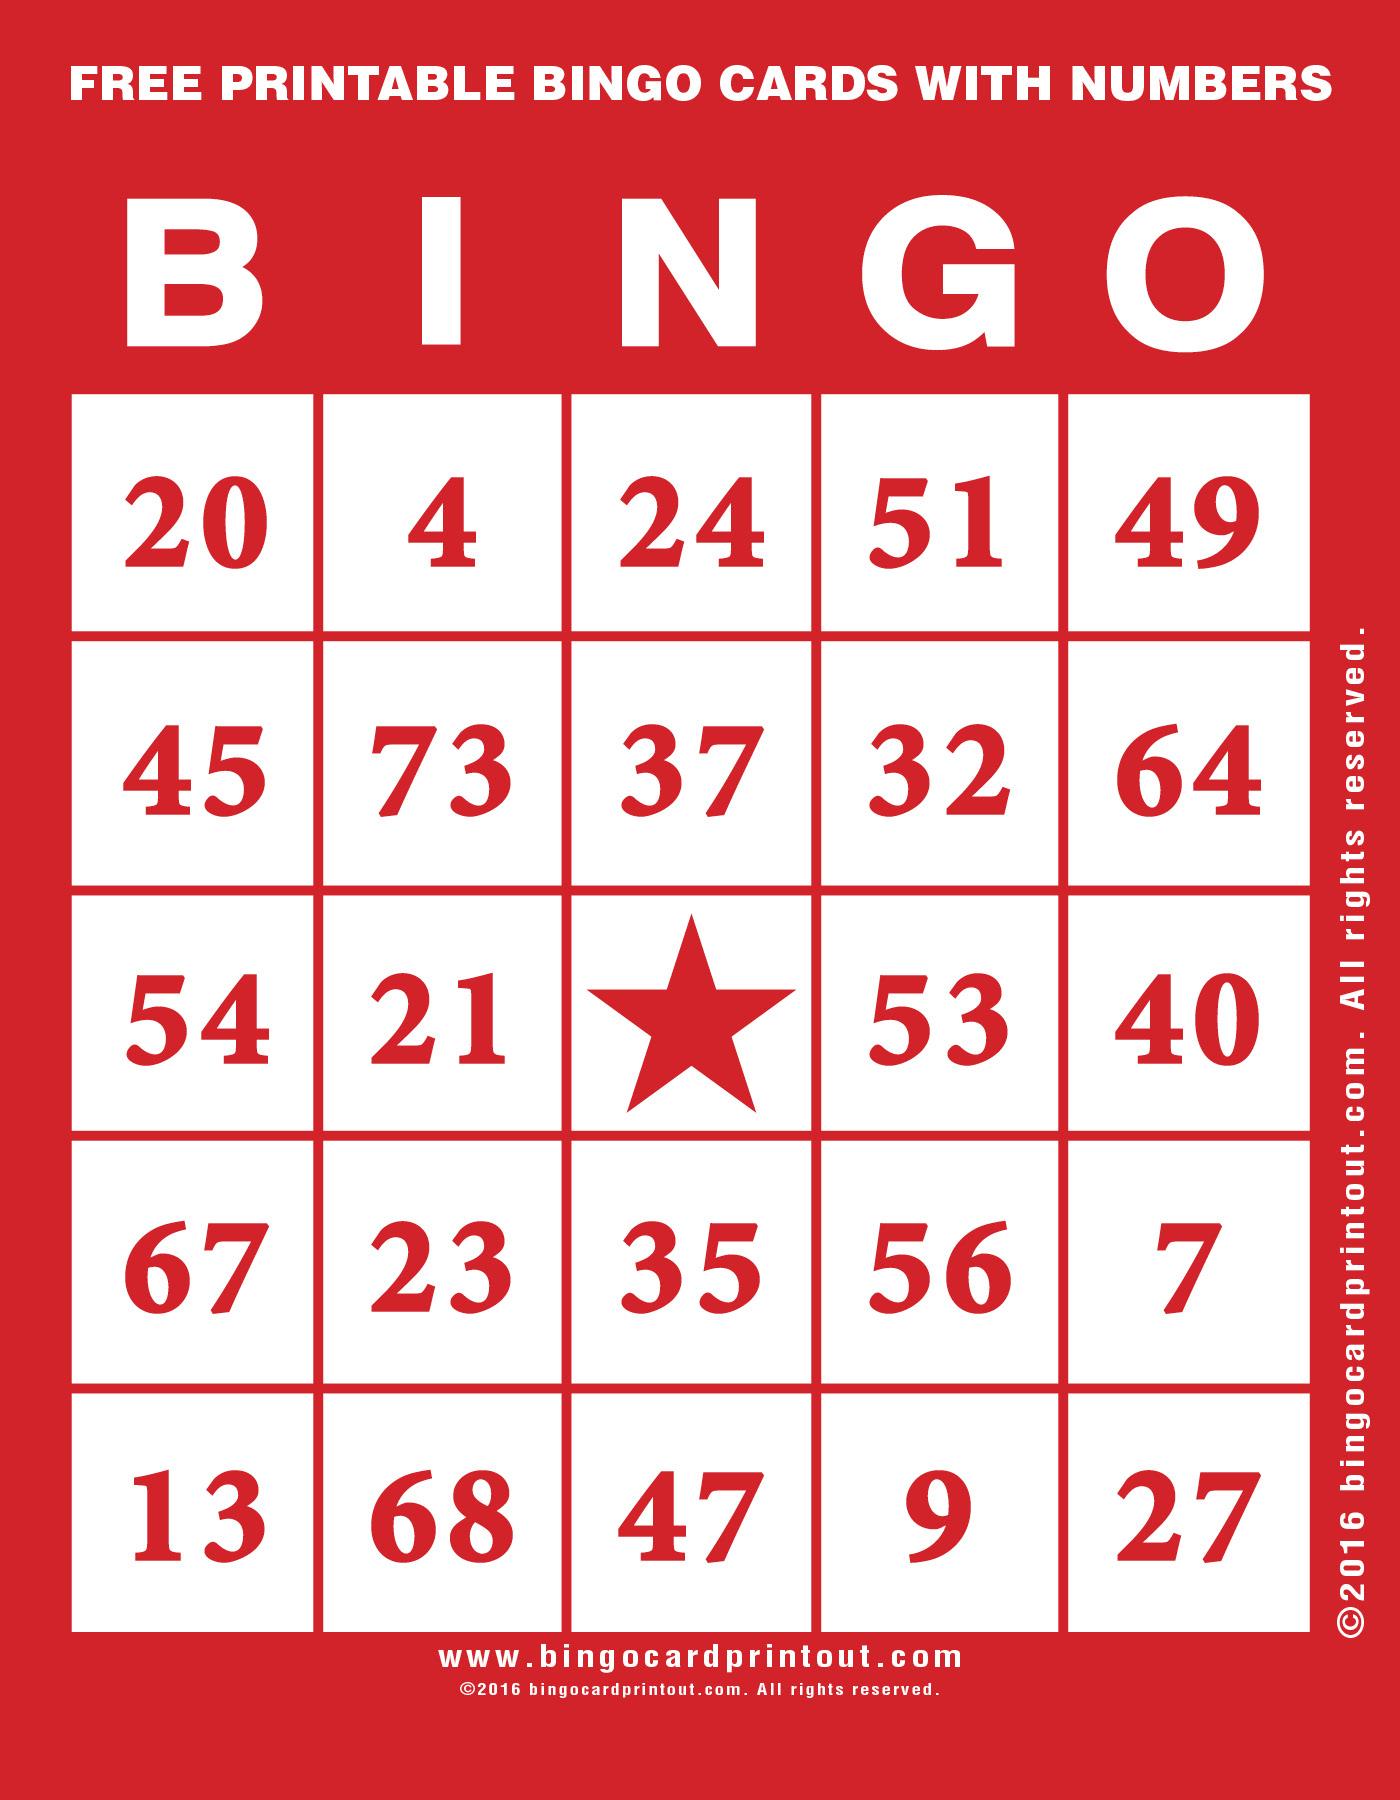 Free Printable Bingo Cards With Numbers - Bingocardprintout